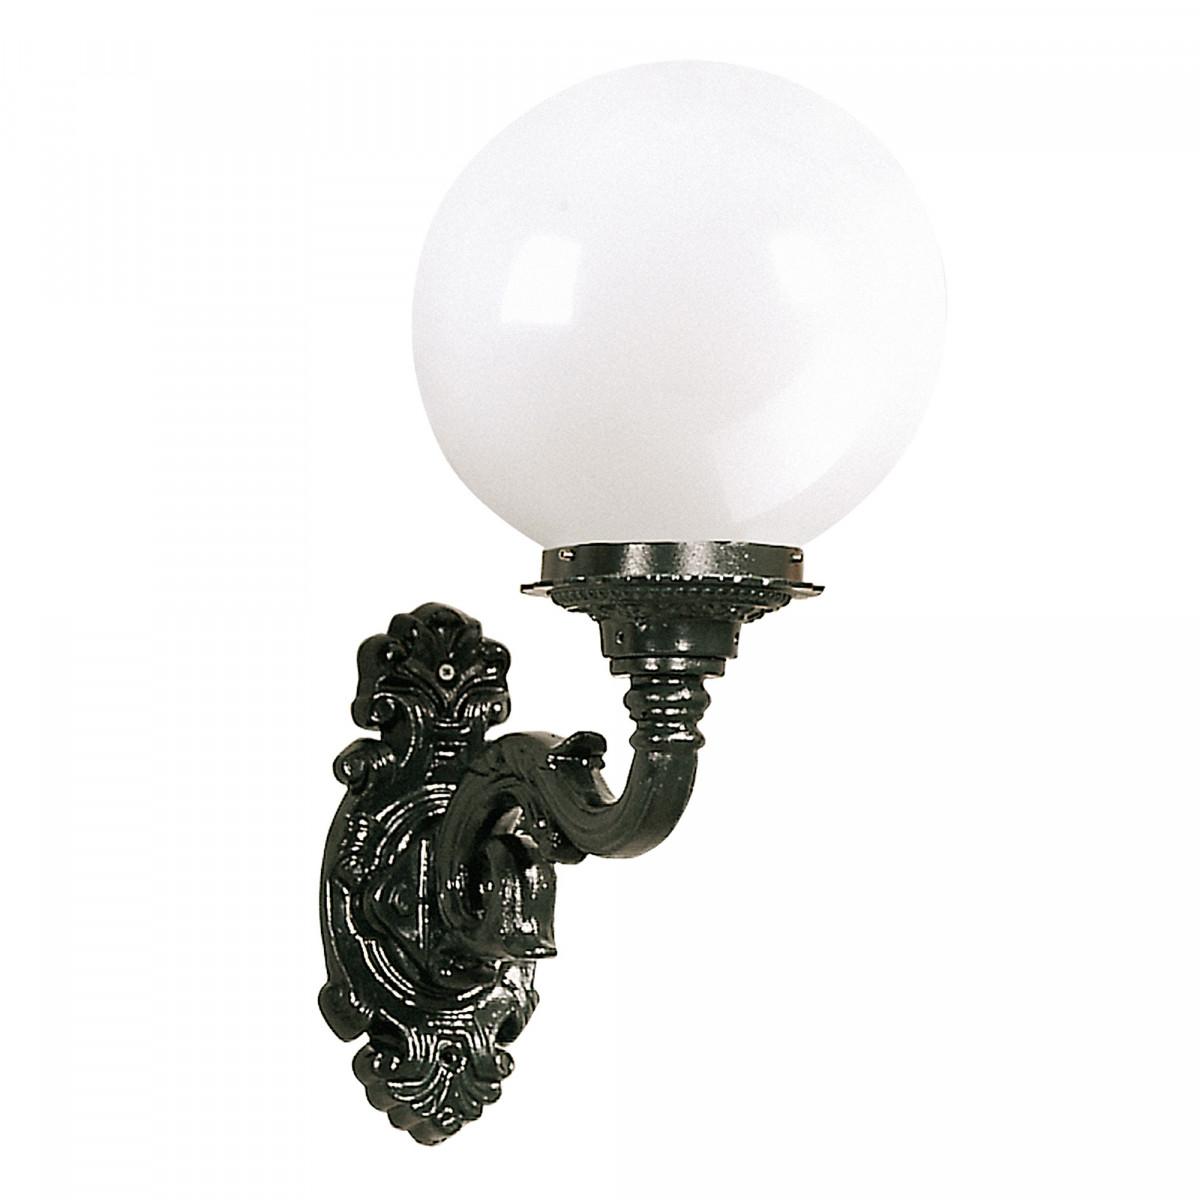 buitenlamp nice, klassieke buitenverlichting met bol